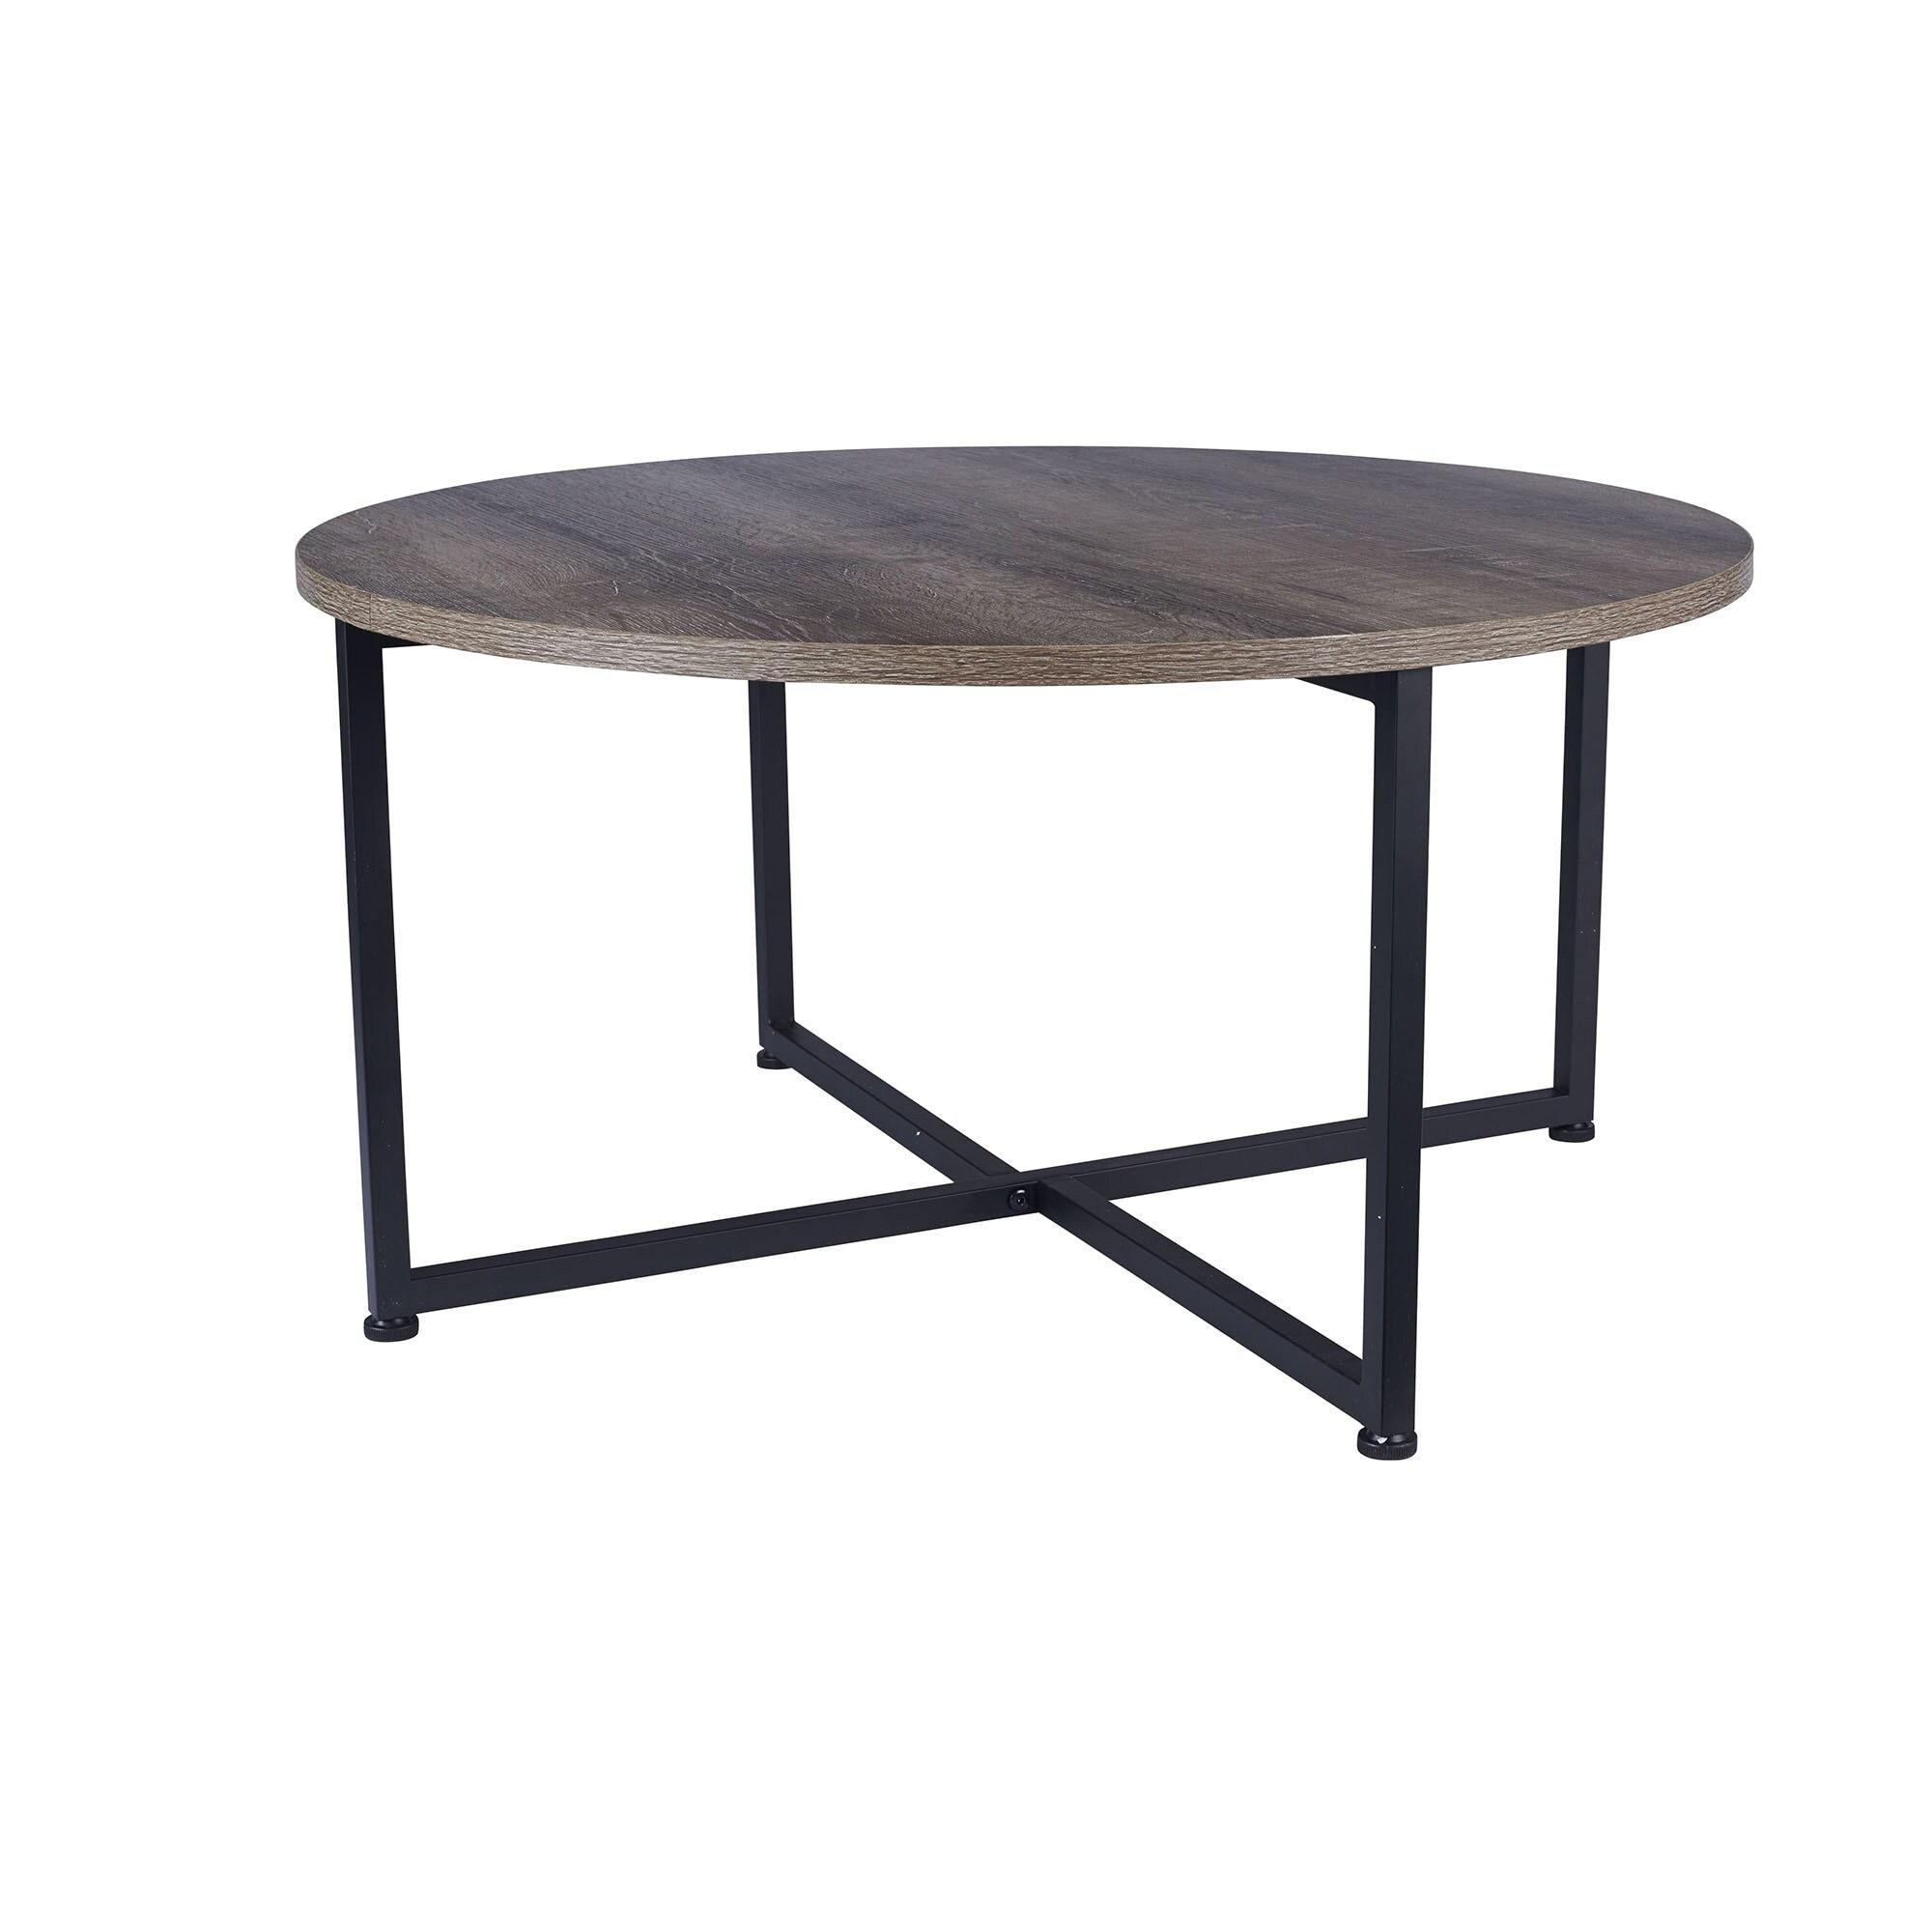 - Shop Carbon Loft Cartwright Distressed Ash Grey-finished Laminate